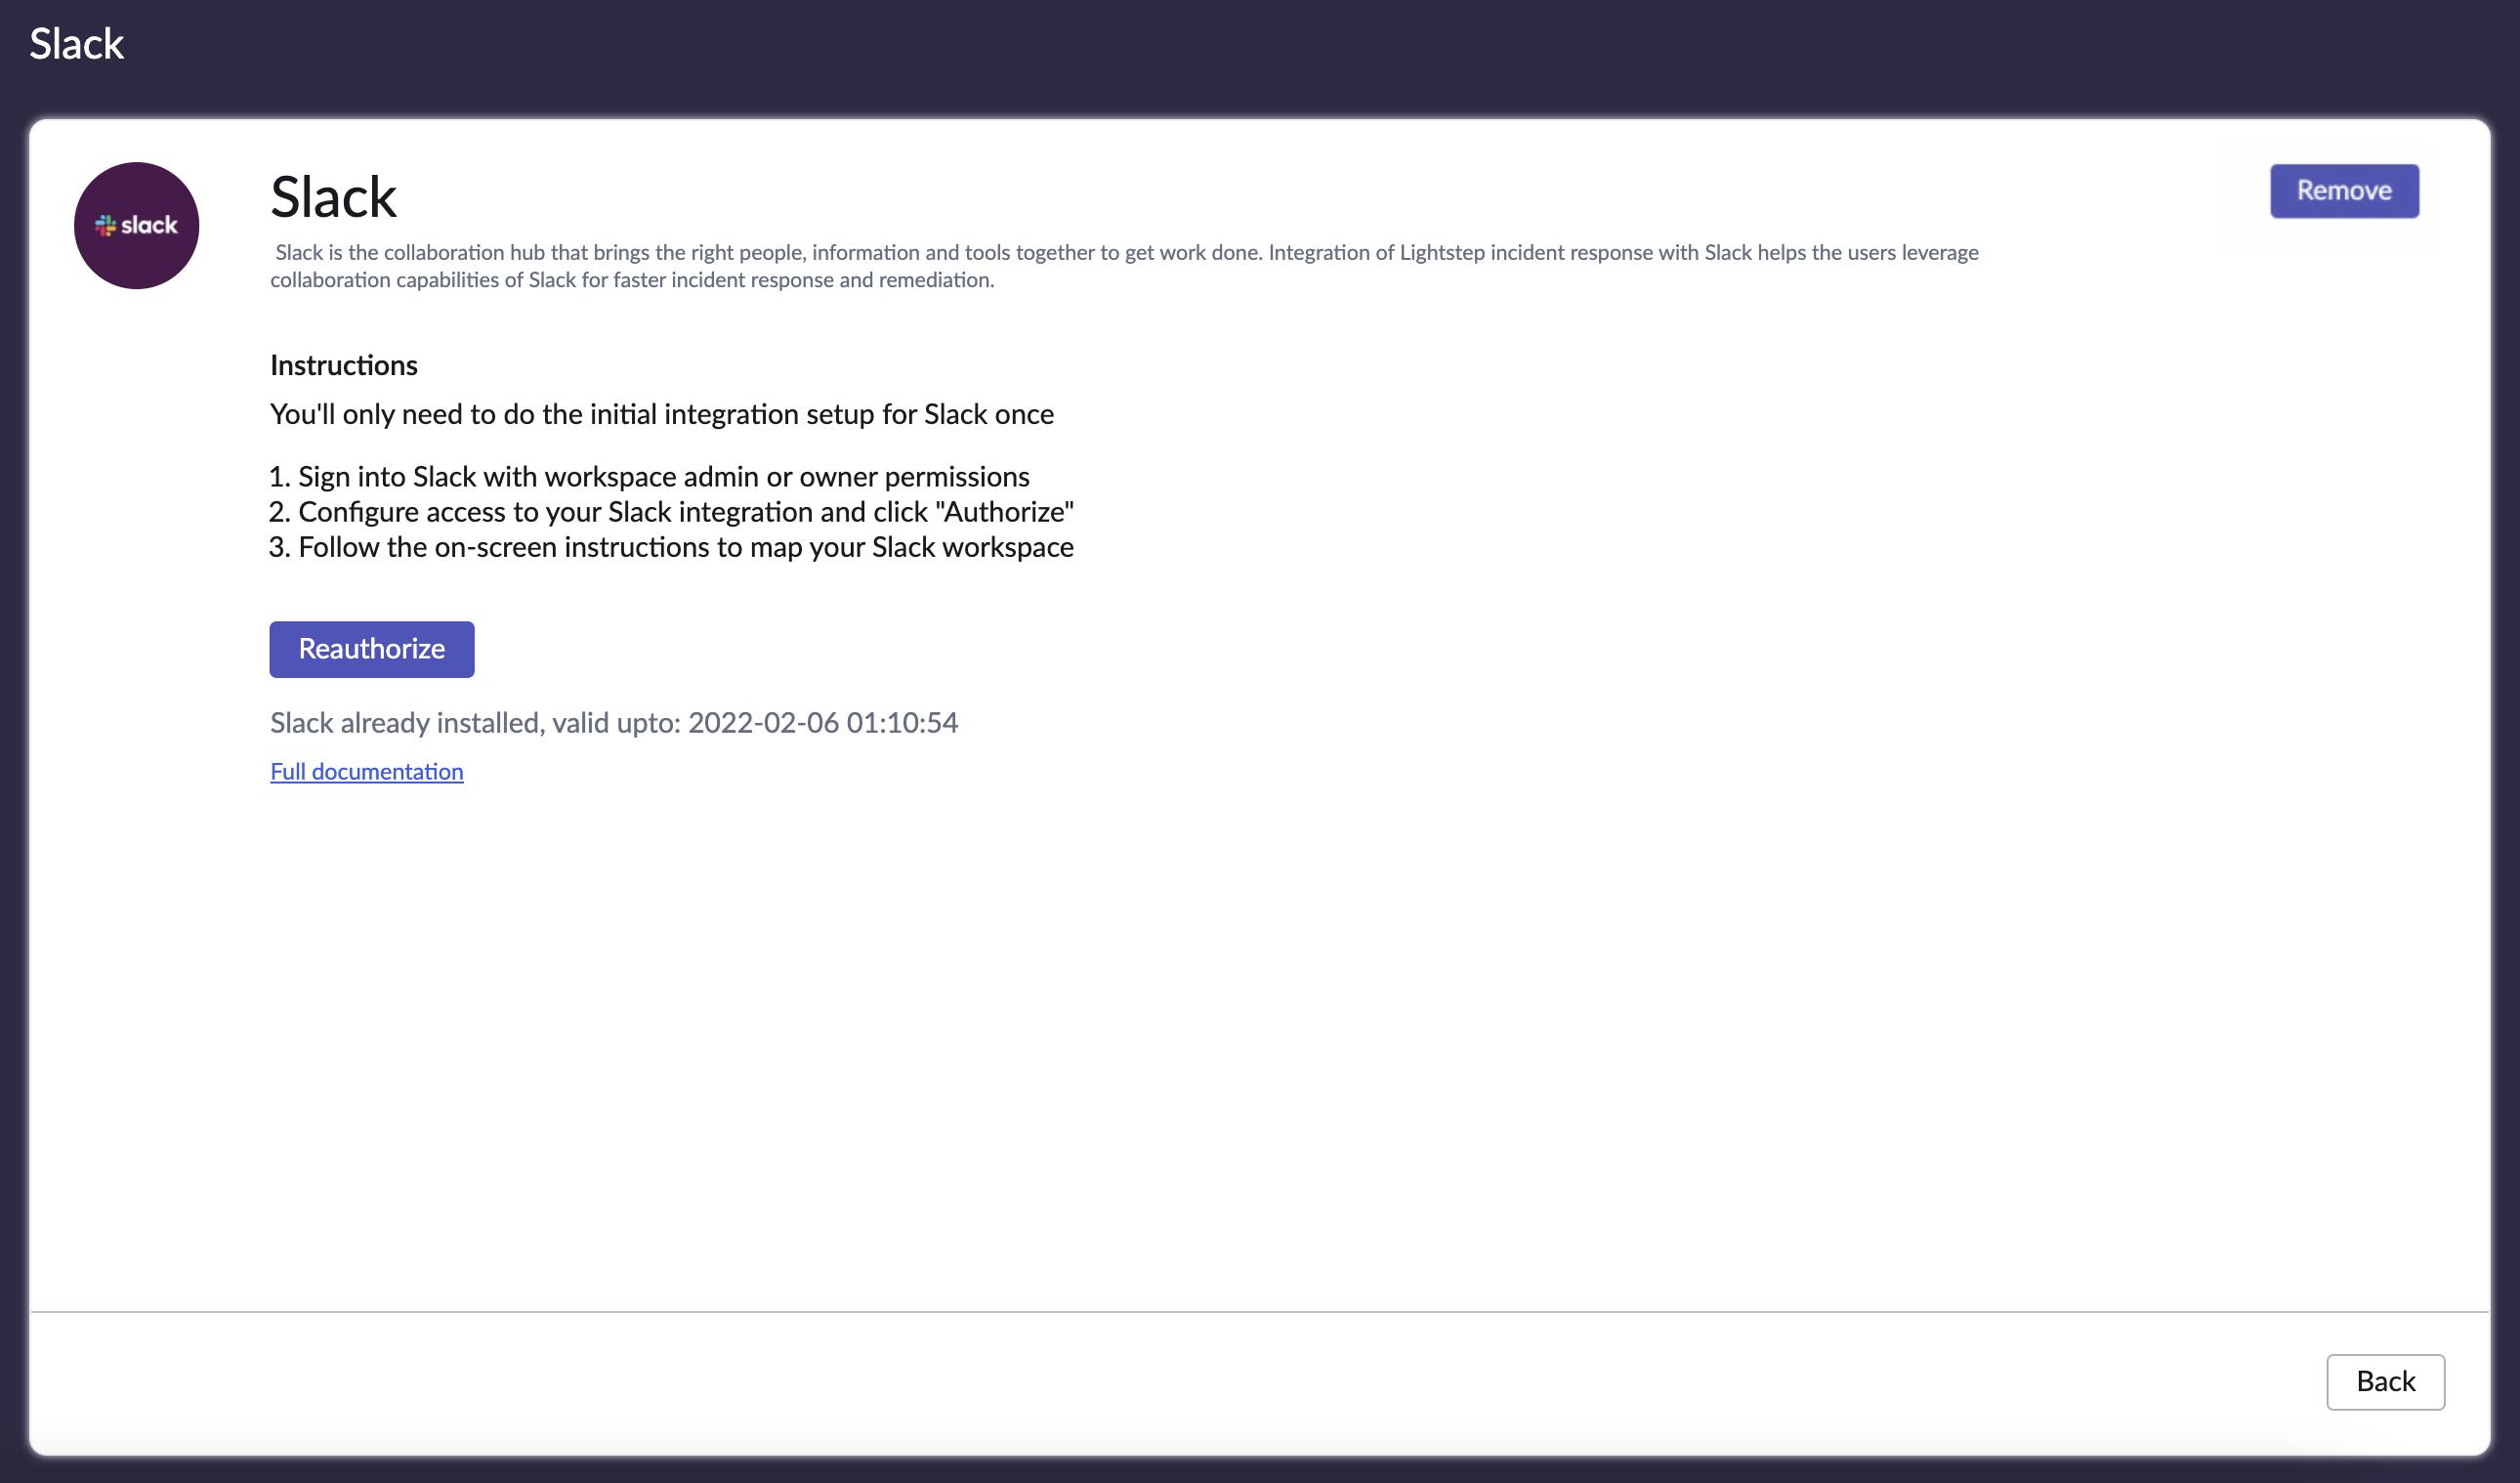 Reauthorize Slack integration.